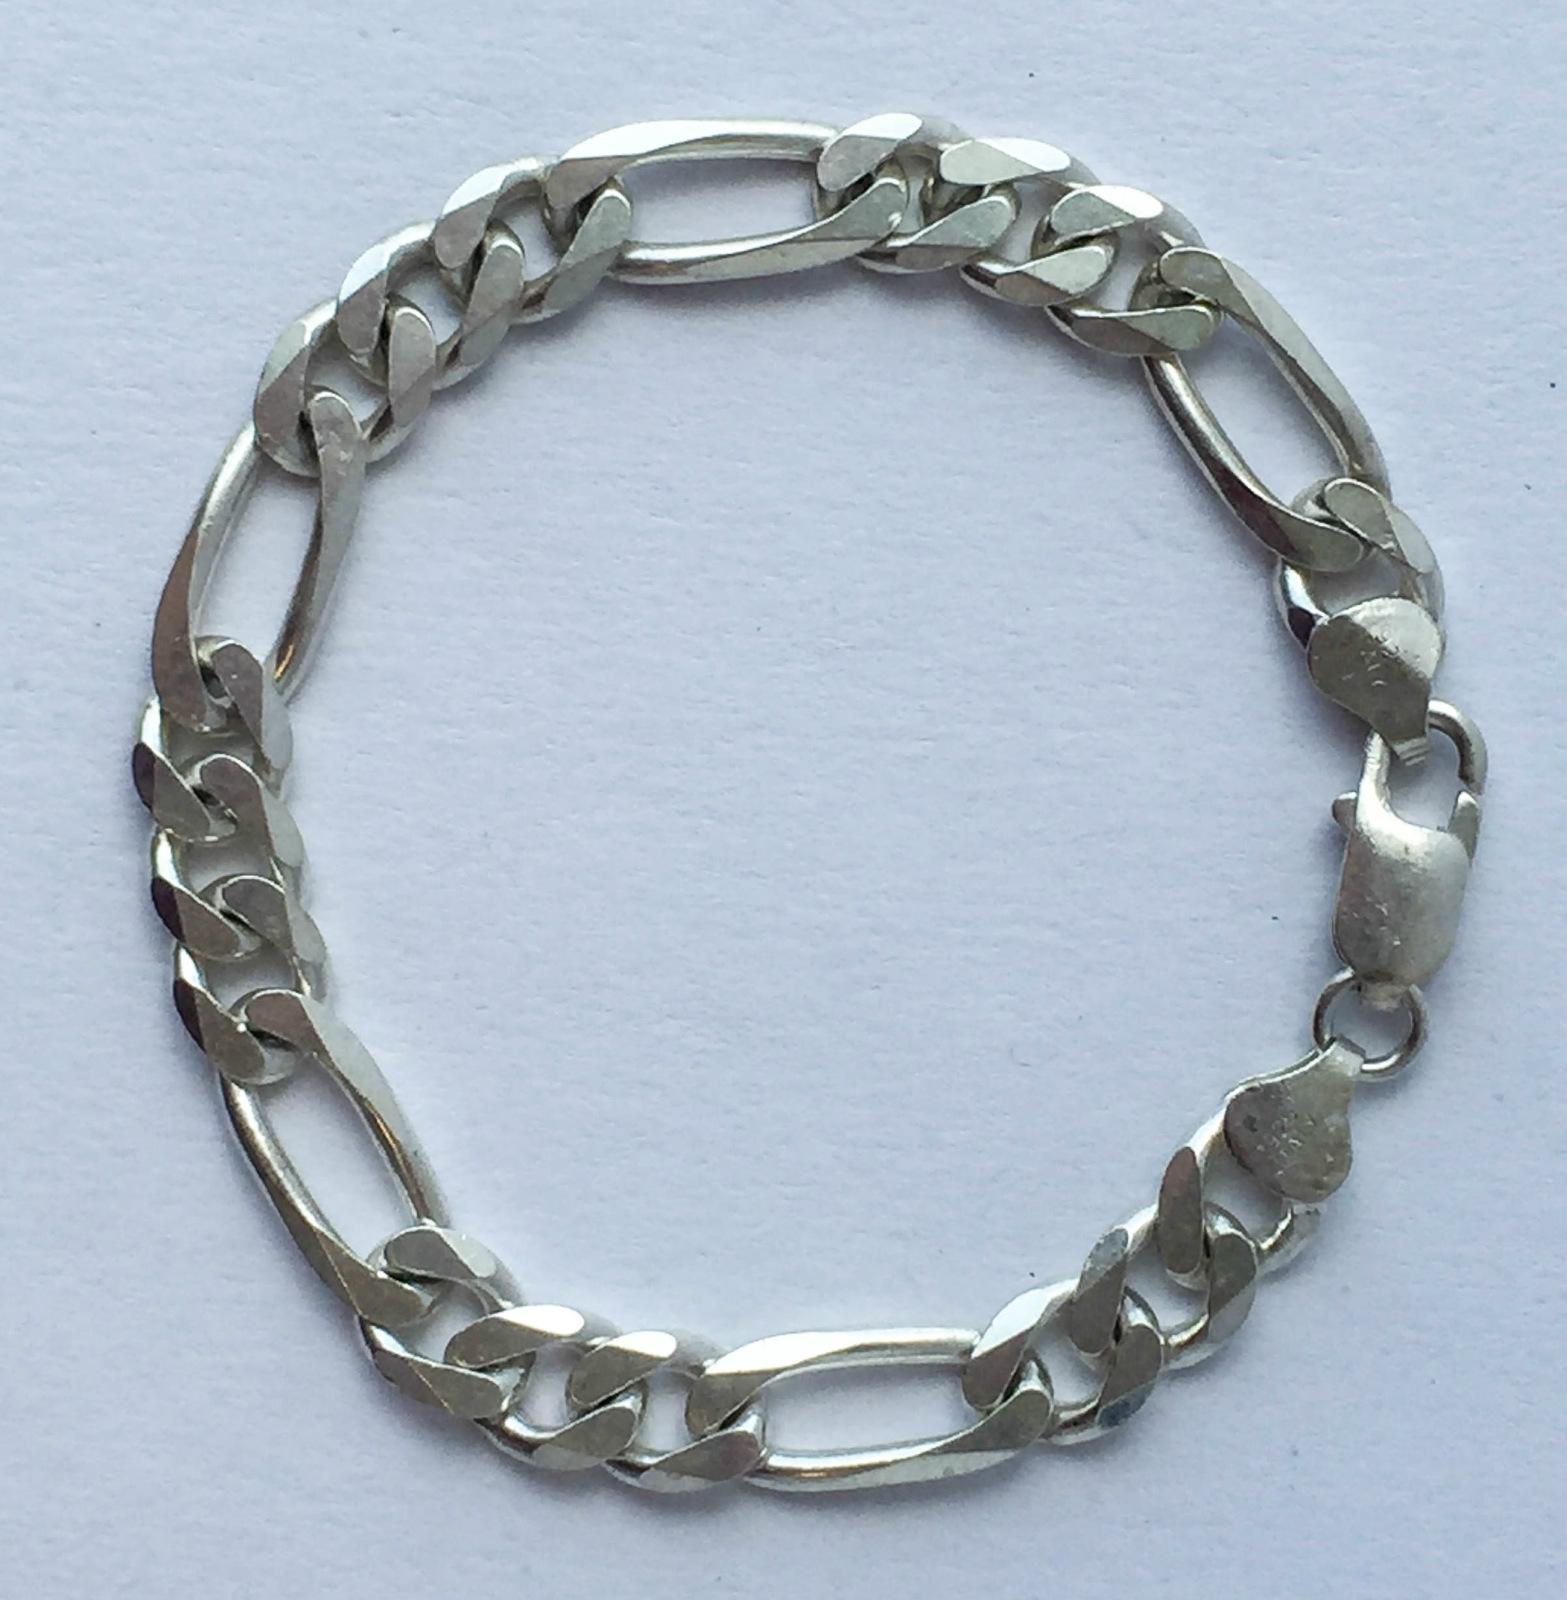 Silver Chain Link Bracelet: ESTATE JEWELRY 8 MM WIDE .925 STERLING SILVER FIGARO CHAIN